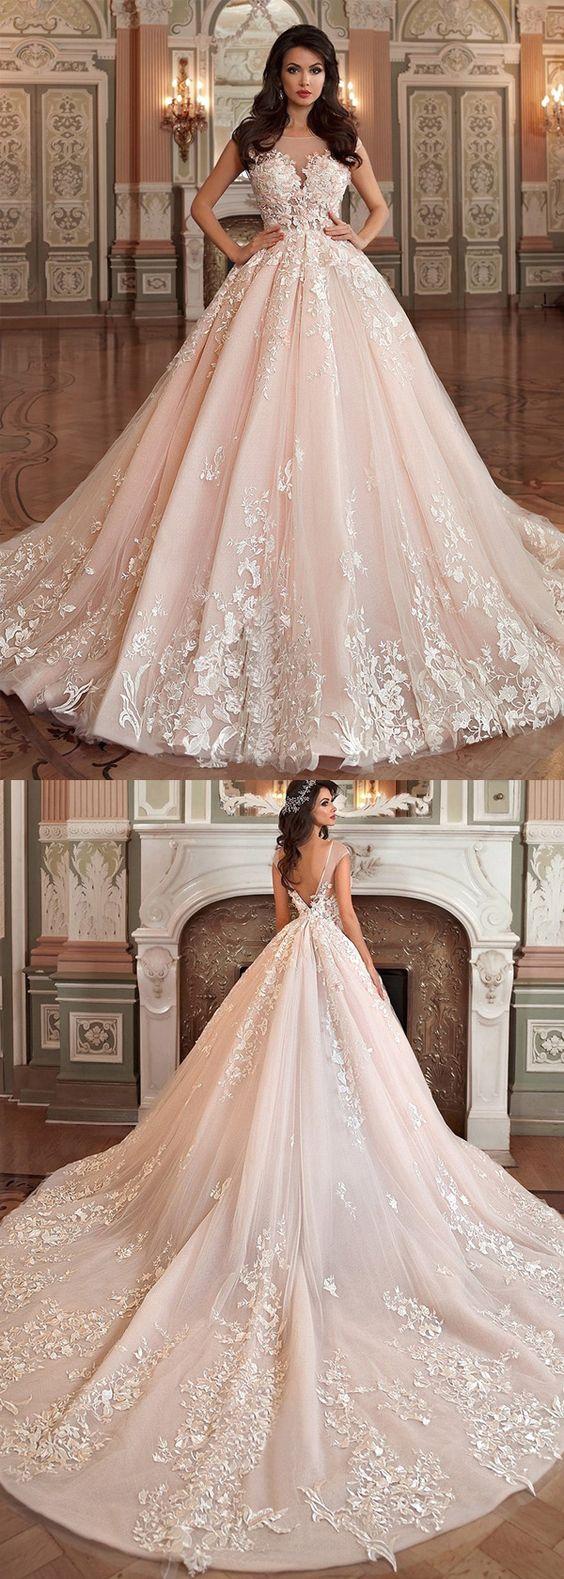 Stunning Tulle & Organza Bateau Neckline Ball Gown Wedding Dress